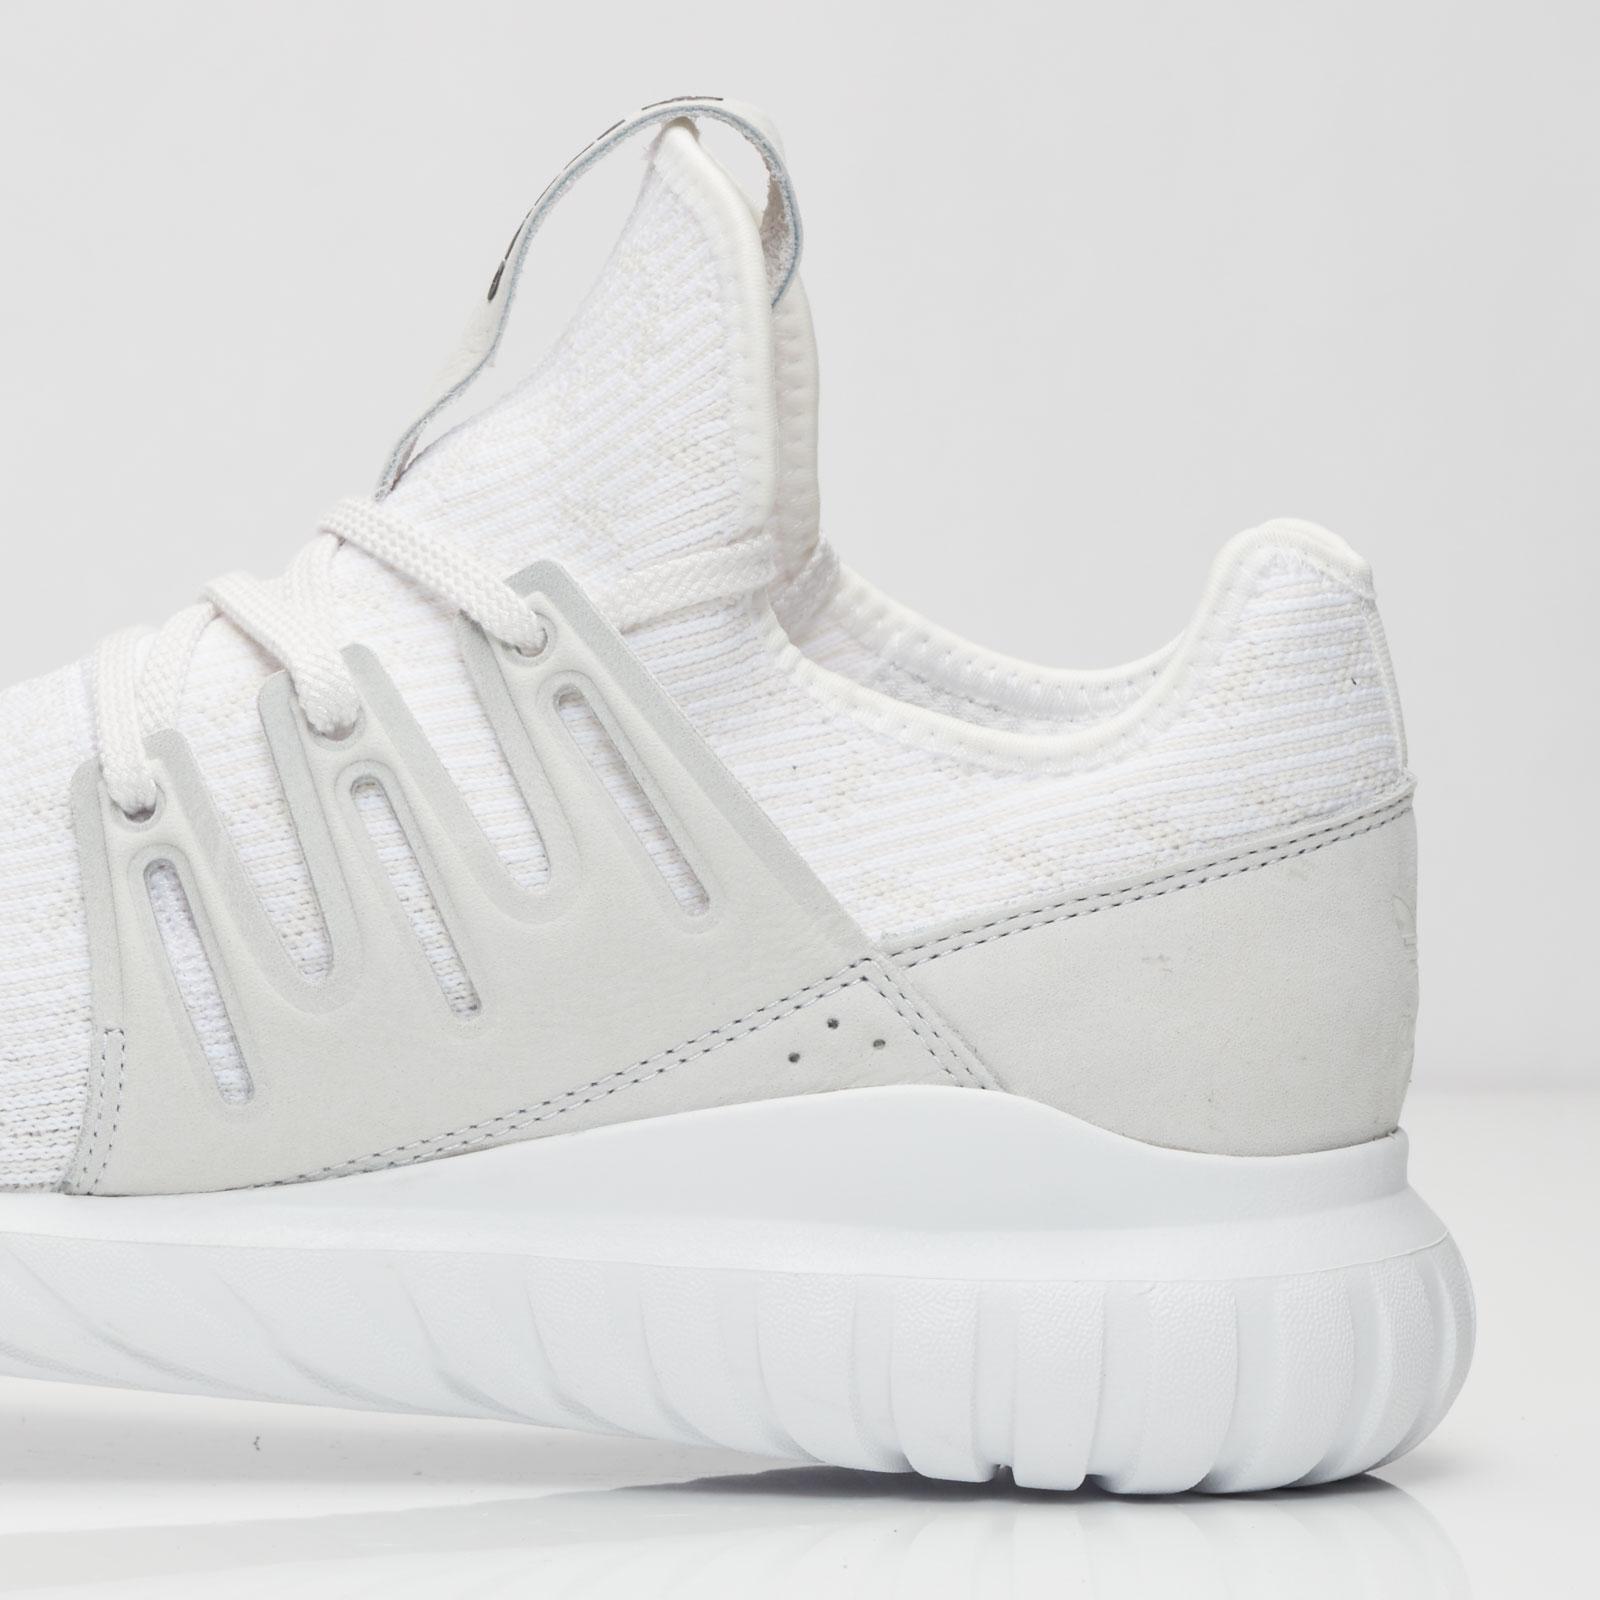 1419ce0cbf23 adidas Tubular Radial PK - S76714 - Sneakersnstuff